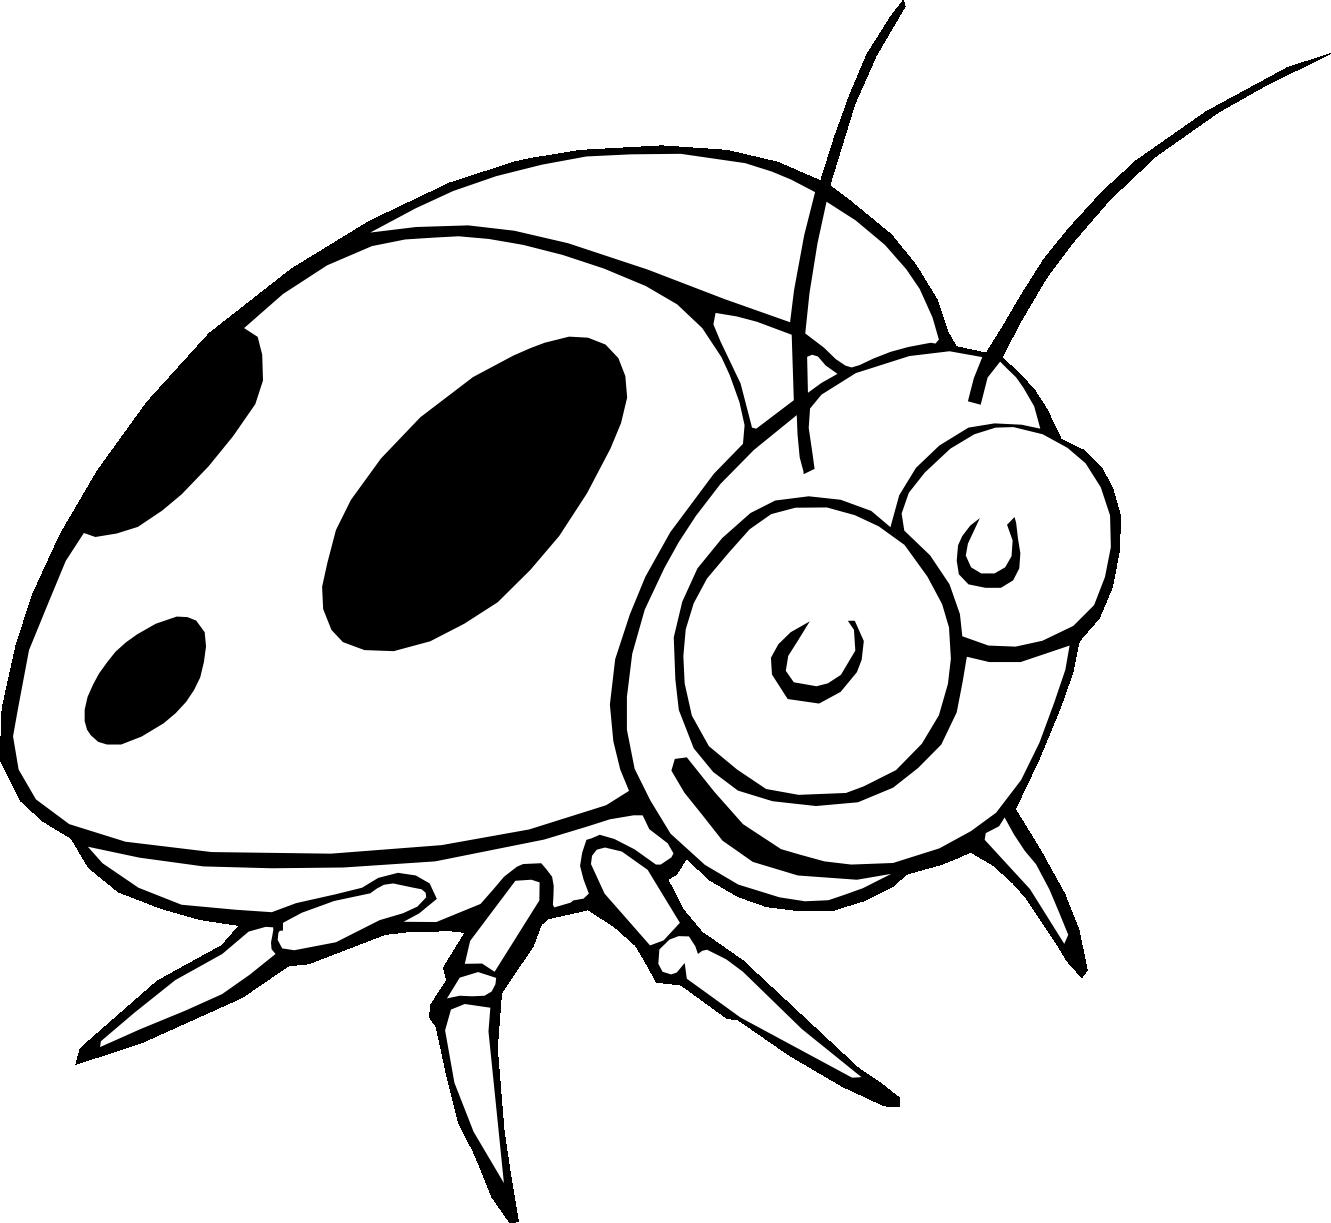 1331x1223 Ladybug Drawing Black And White Clipart Panda